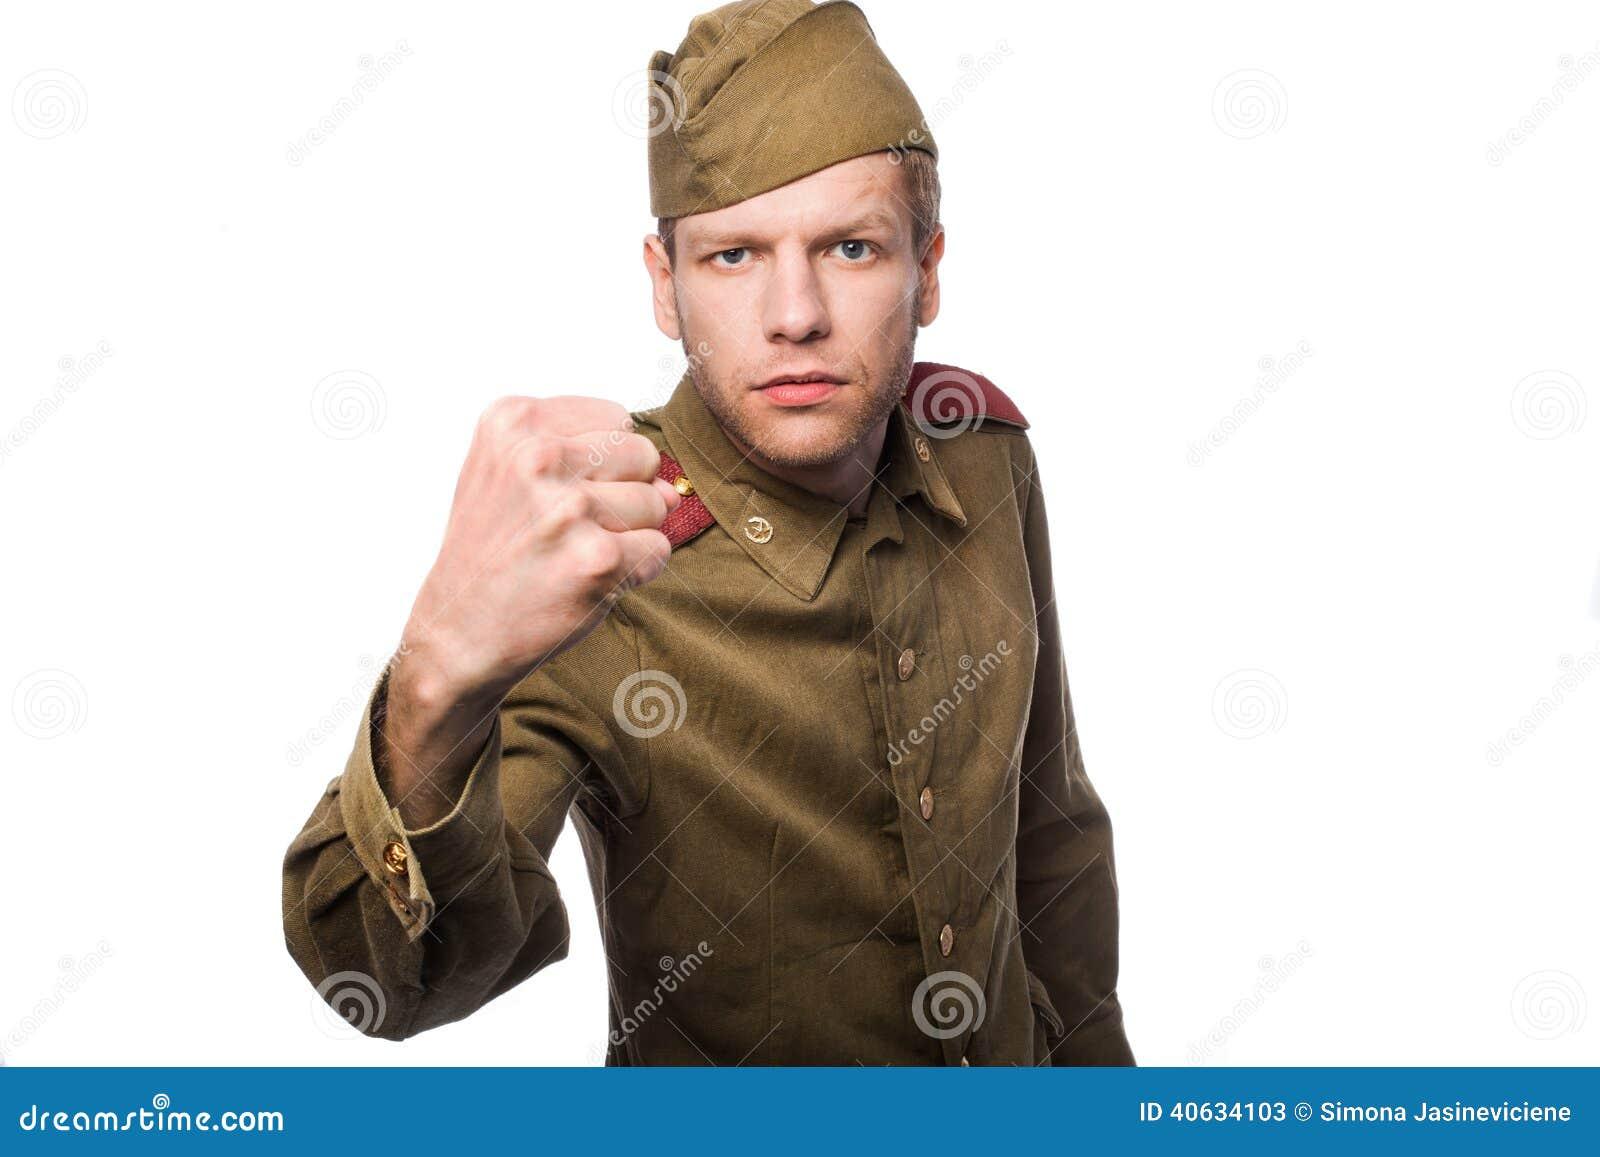 Русский кулак фото 22 фотография